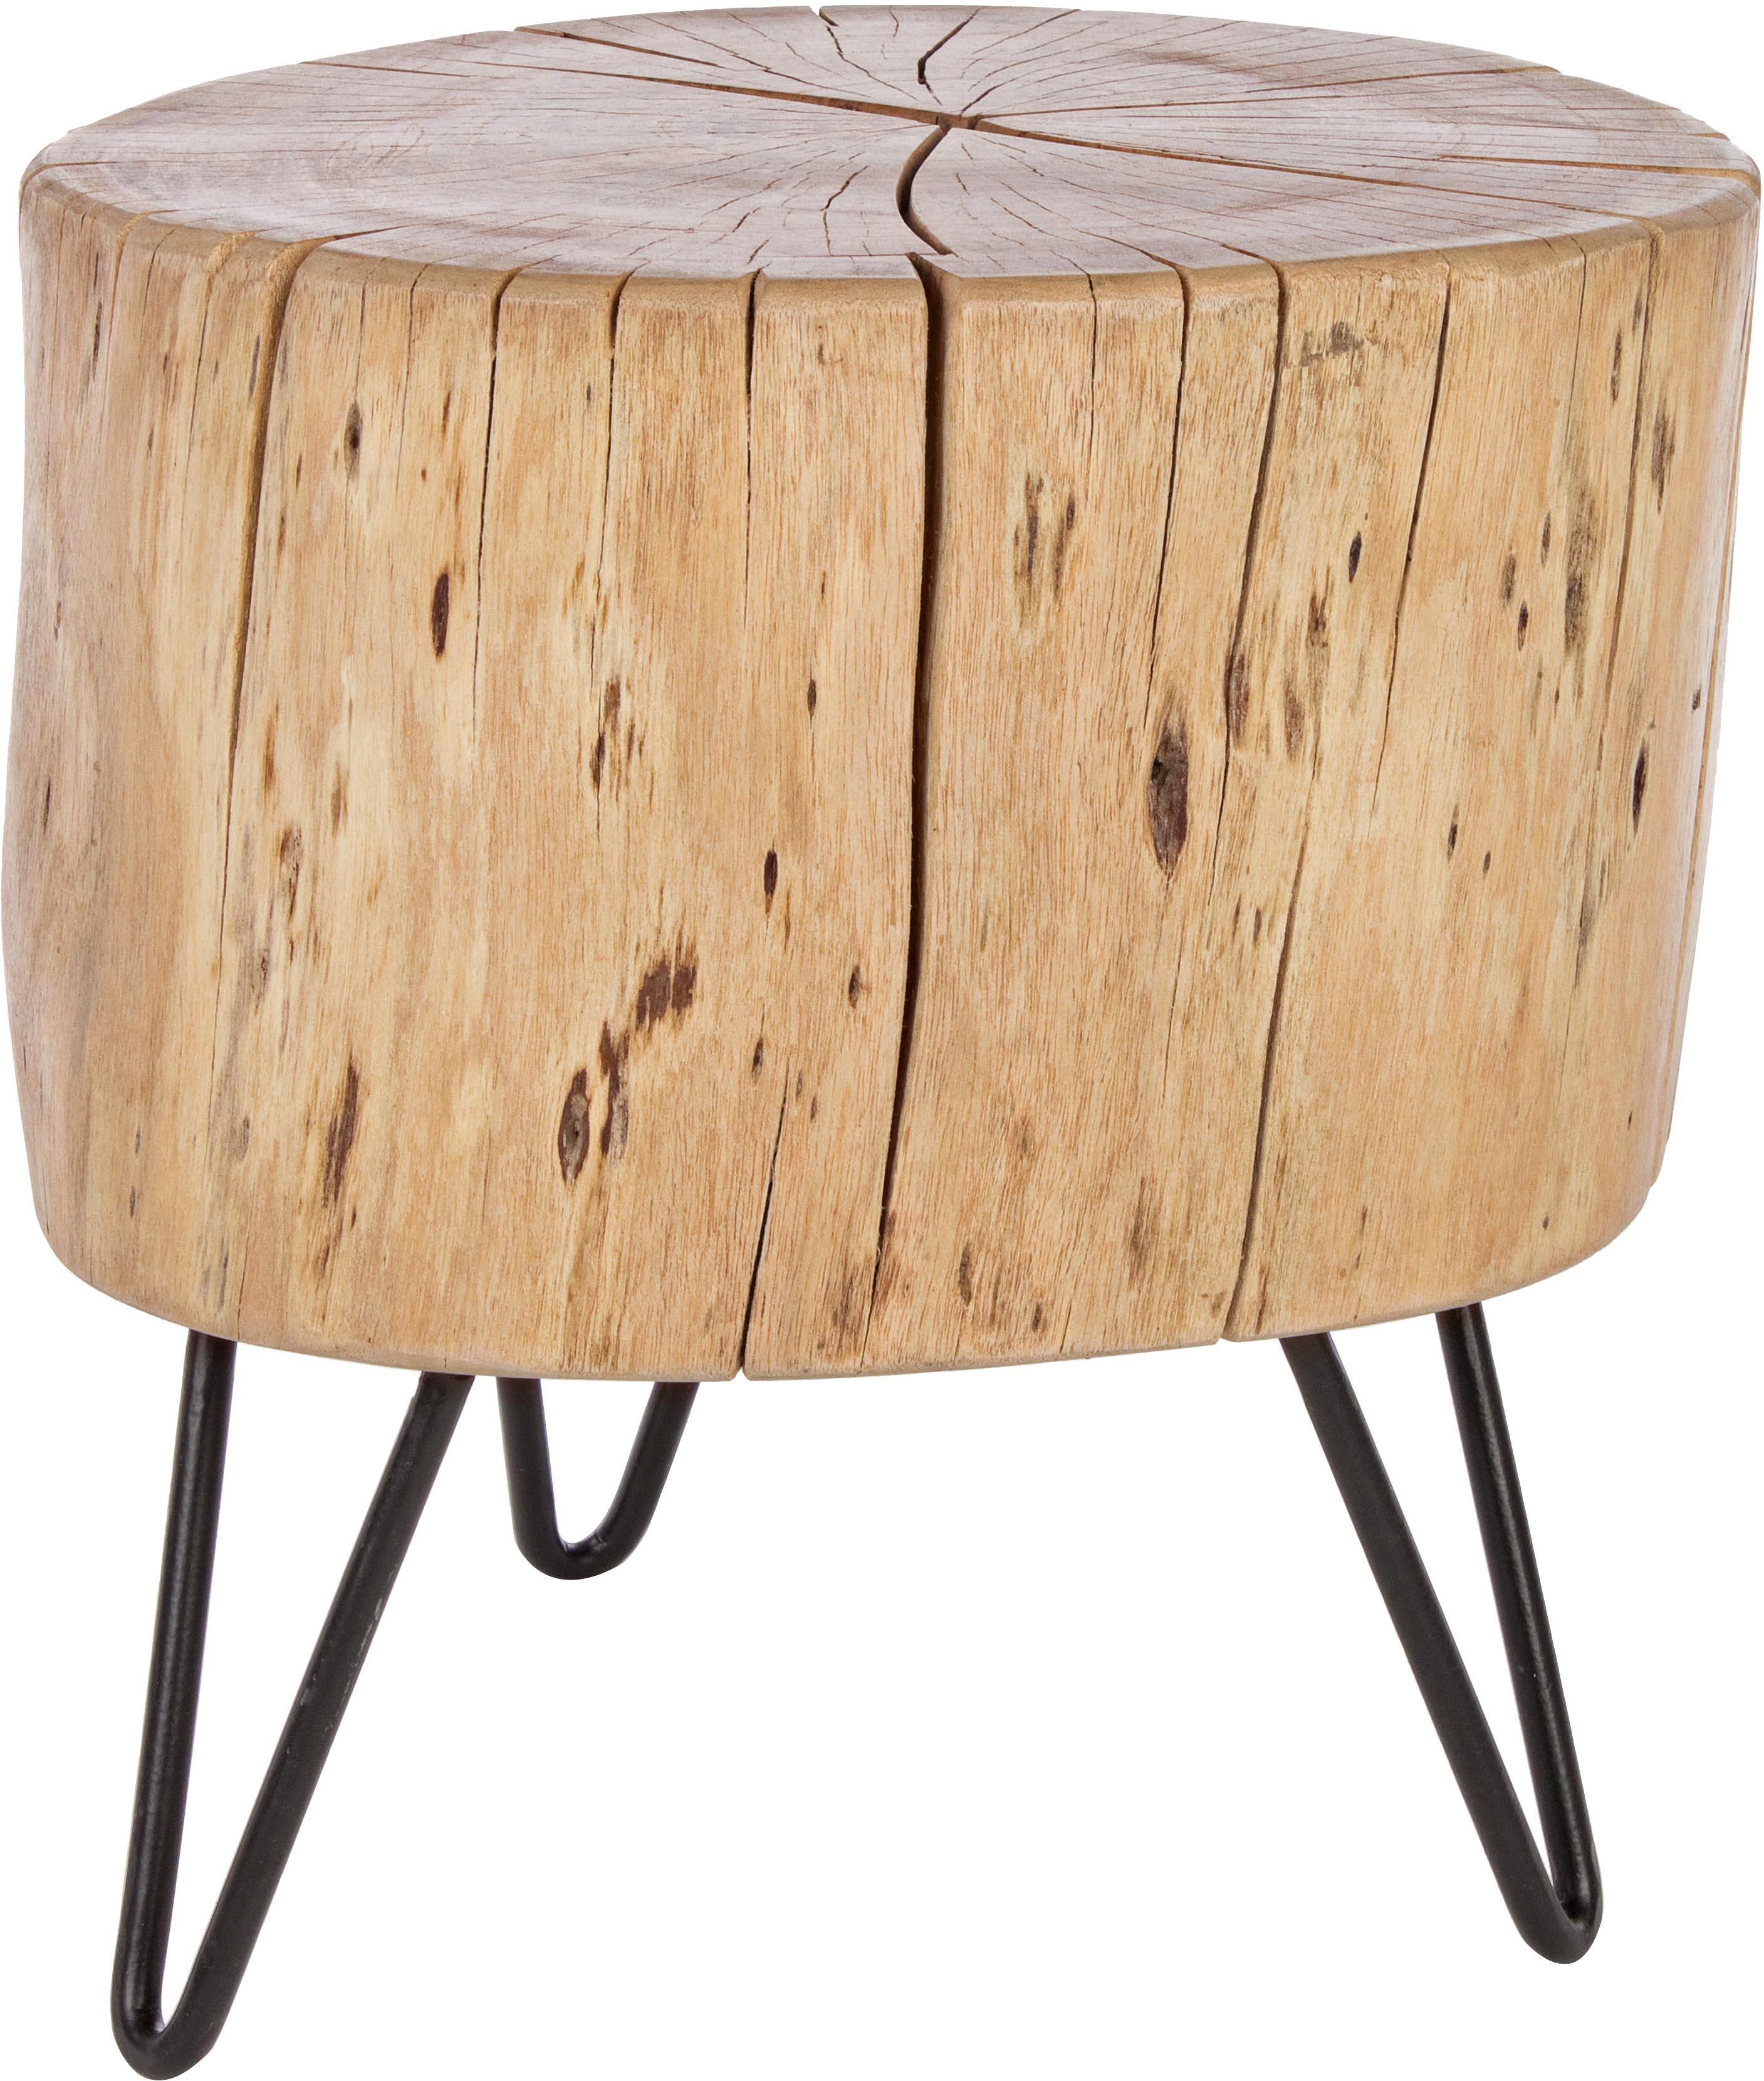 Tavolino in legno d'acacia Arthur, Piano d'appoggio: legno d'acacia, Piedini: metallo, Piano d'appoggio: legno d'acacia, laccato trasparente Piedini: nero, Larg. 35 x Alt. 35 cm